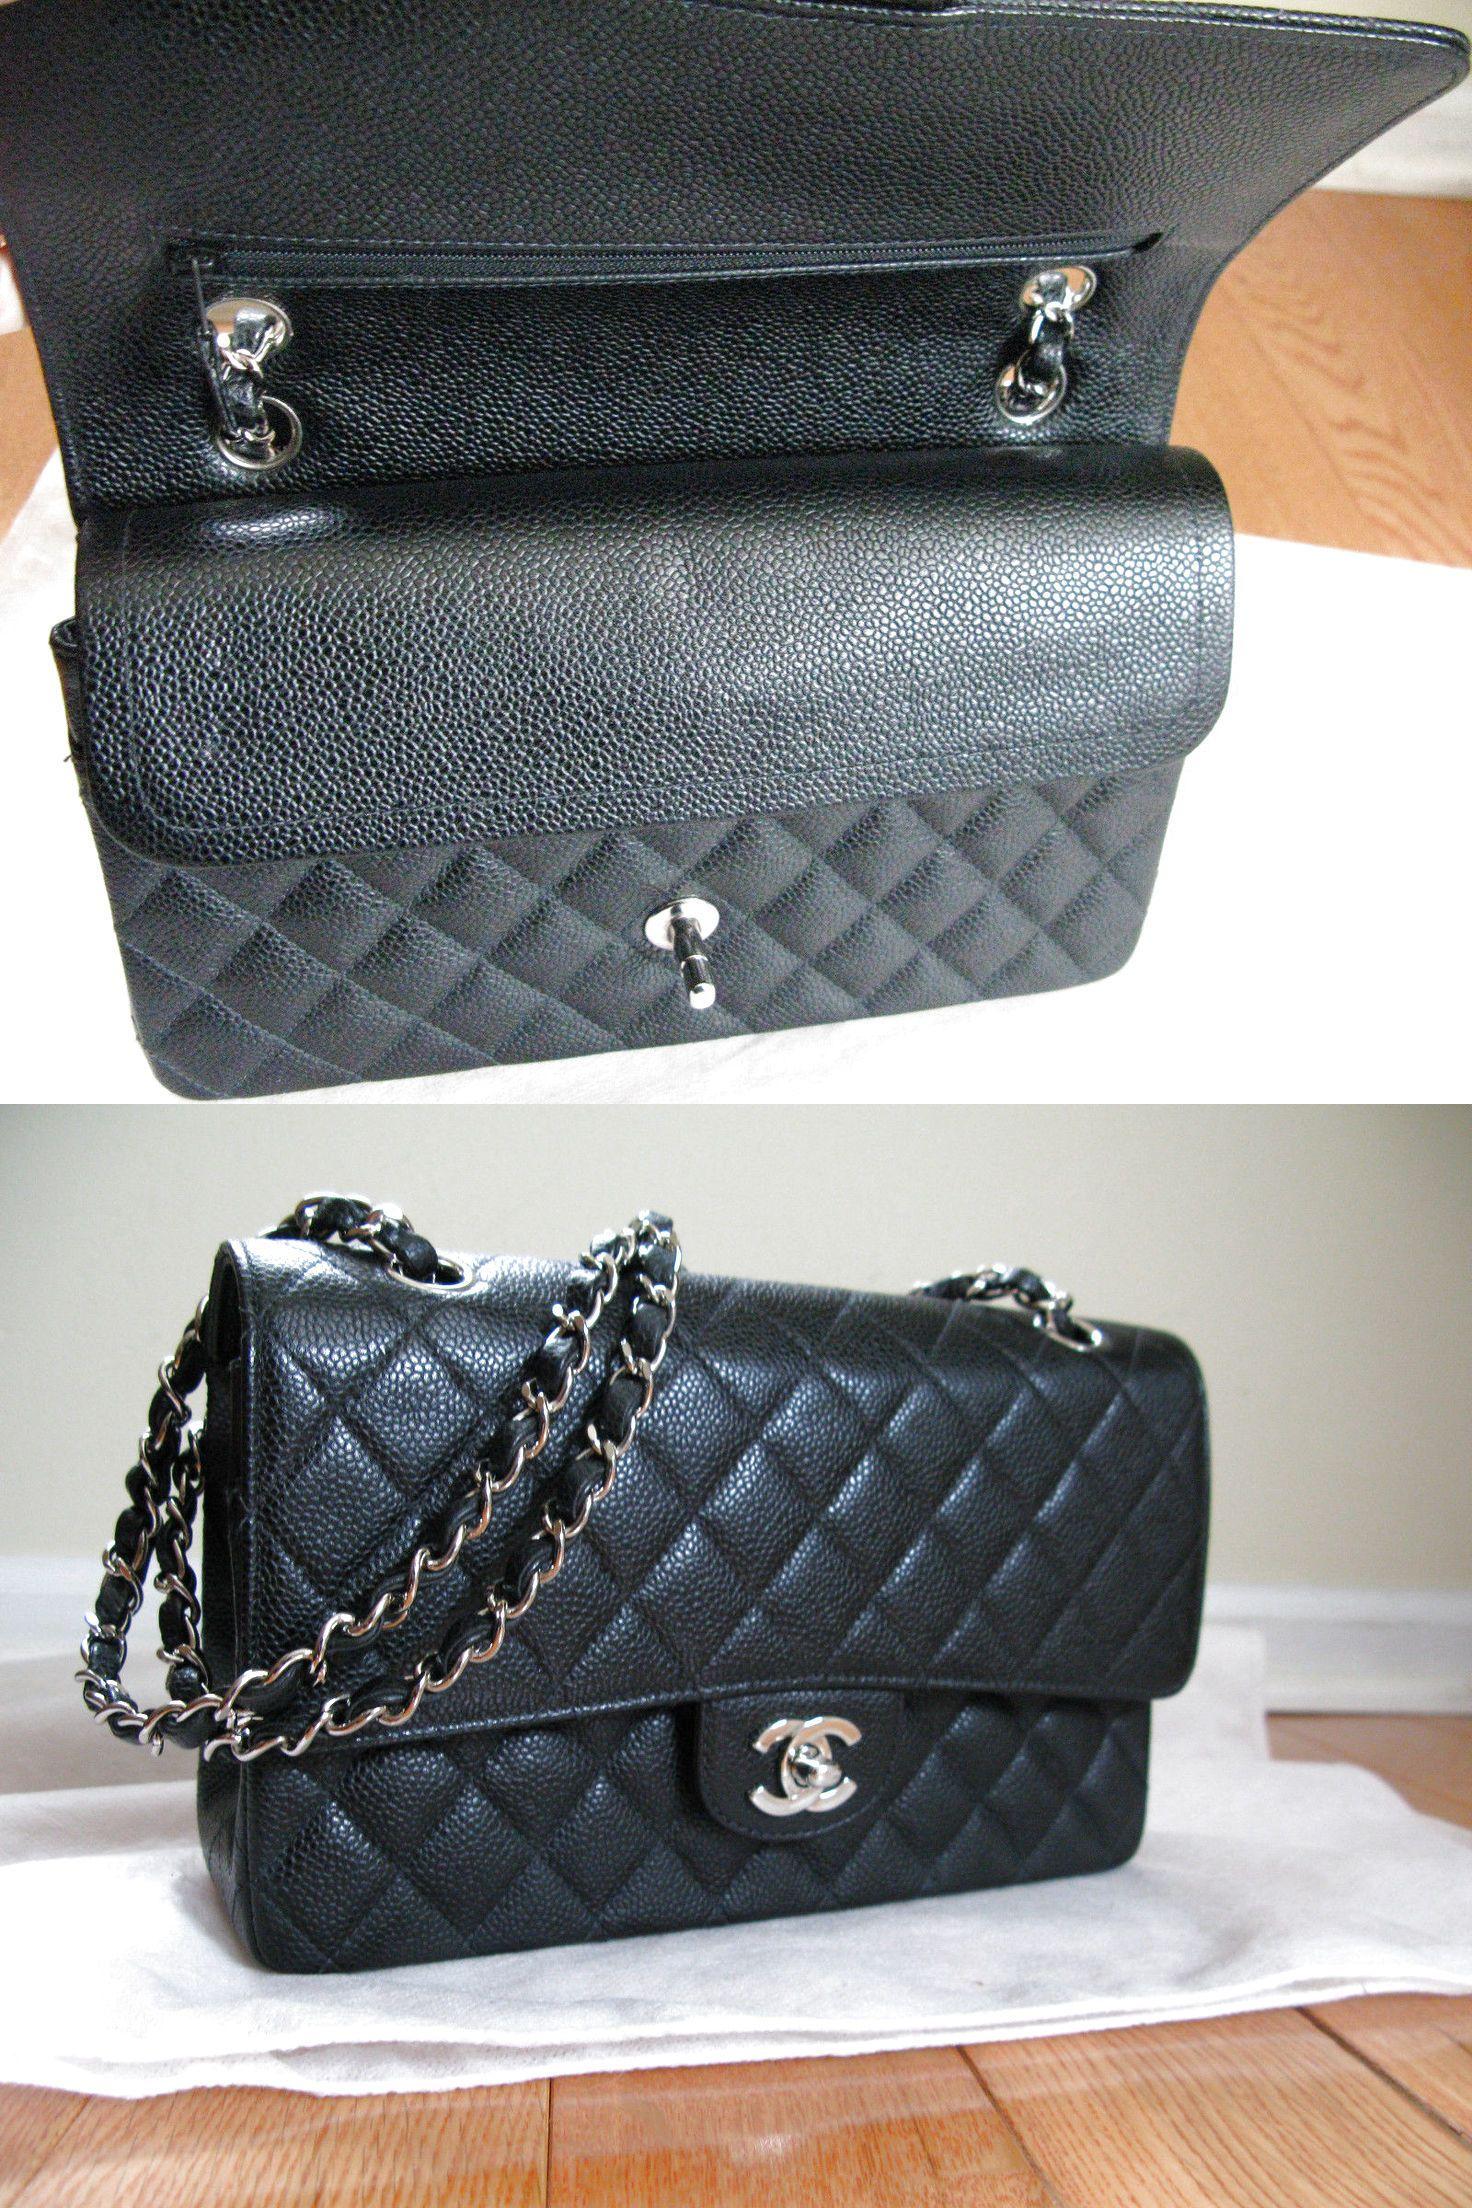 ca18cfa09cd38 EUC Authentic Chanel Black Caviar Medium 2.55 Classic Double Flap Bag   3499.0